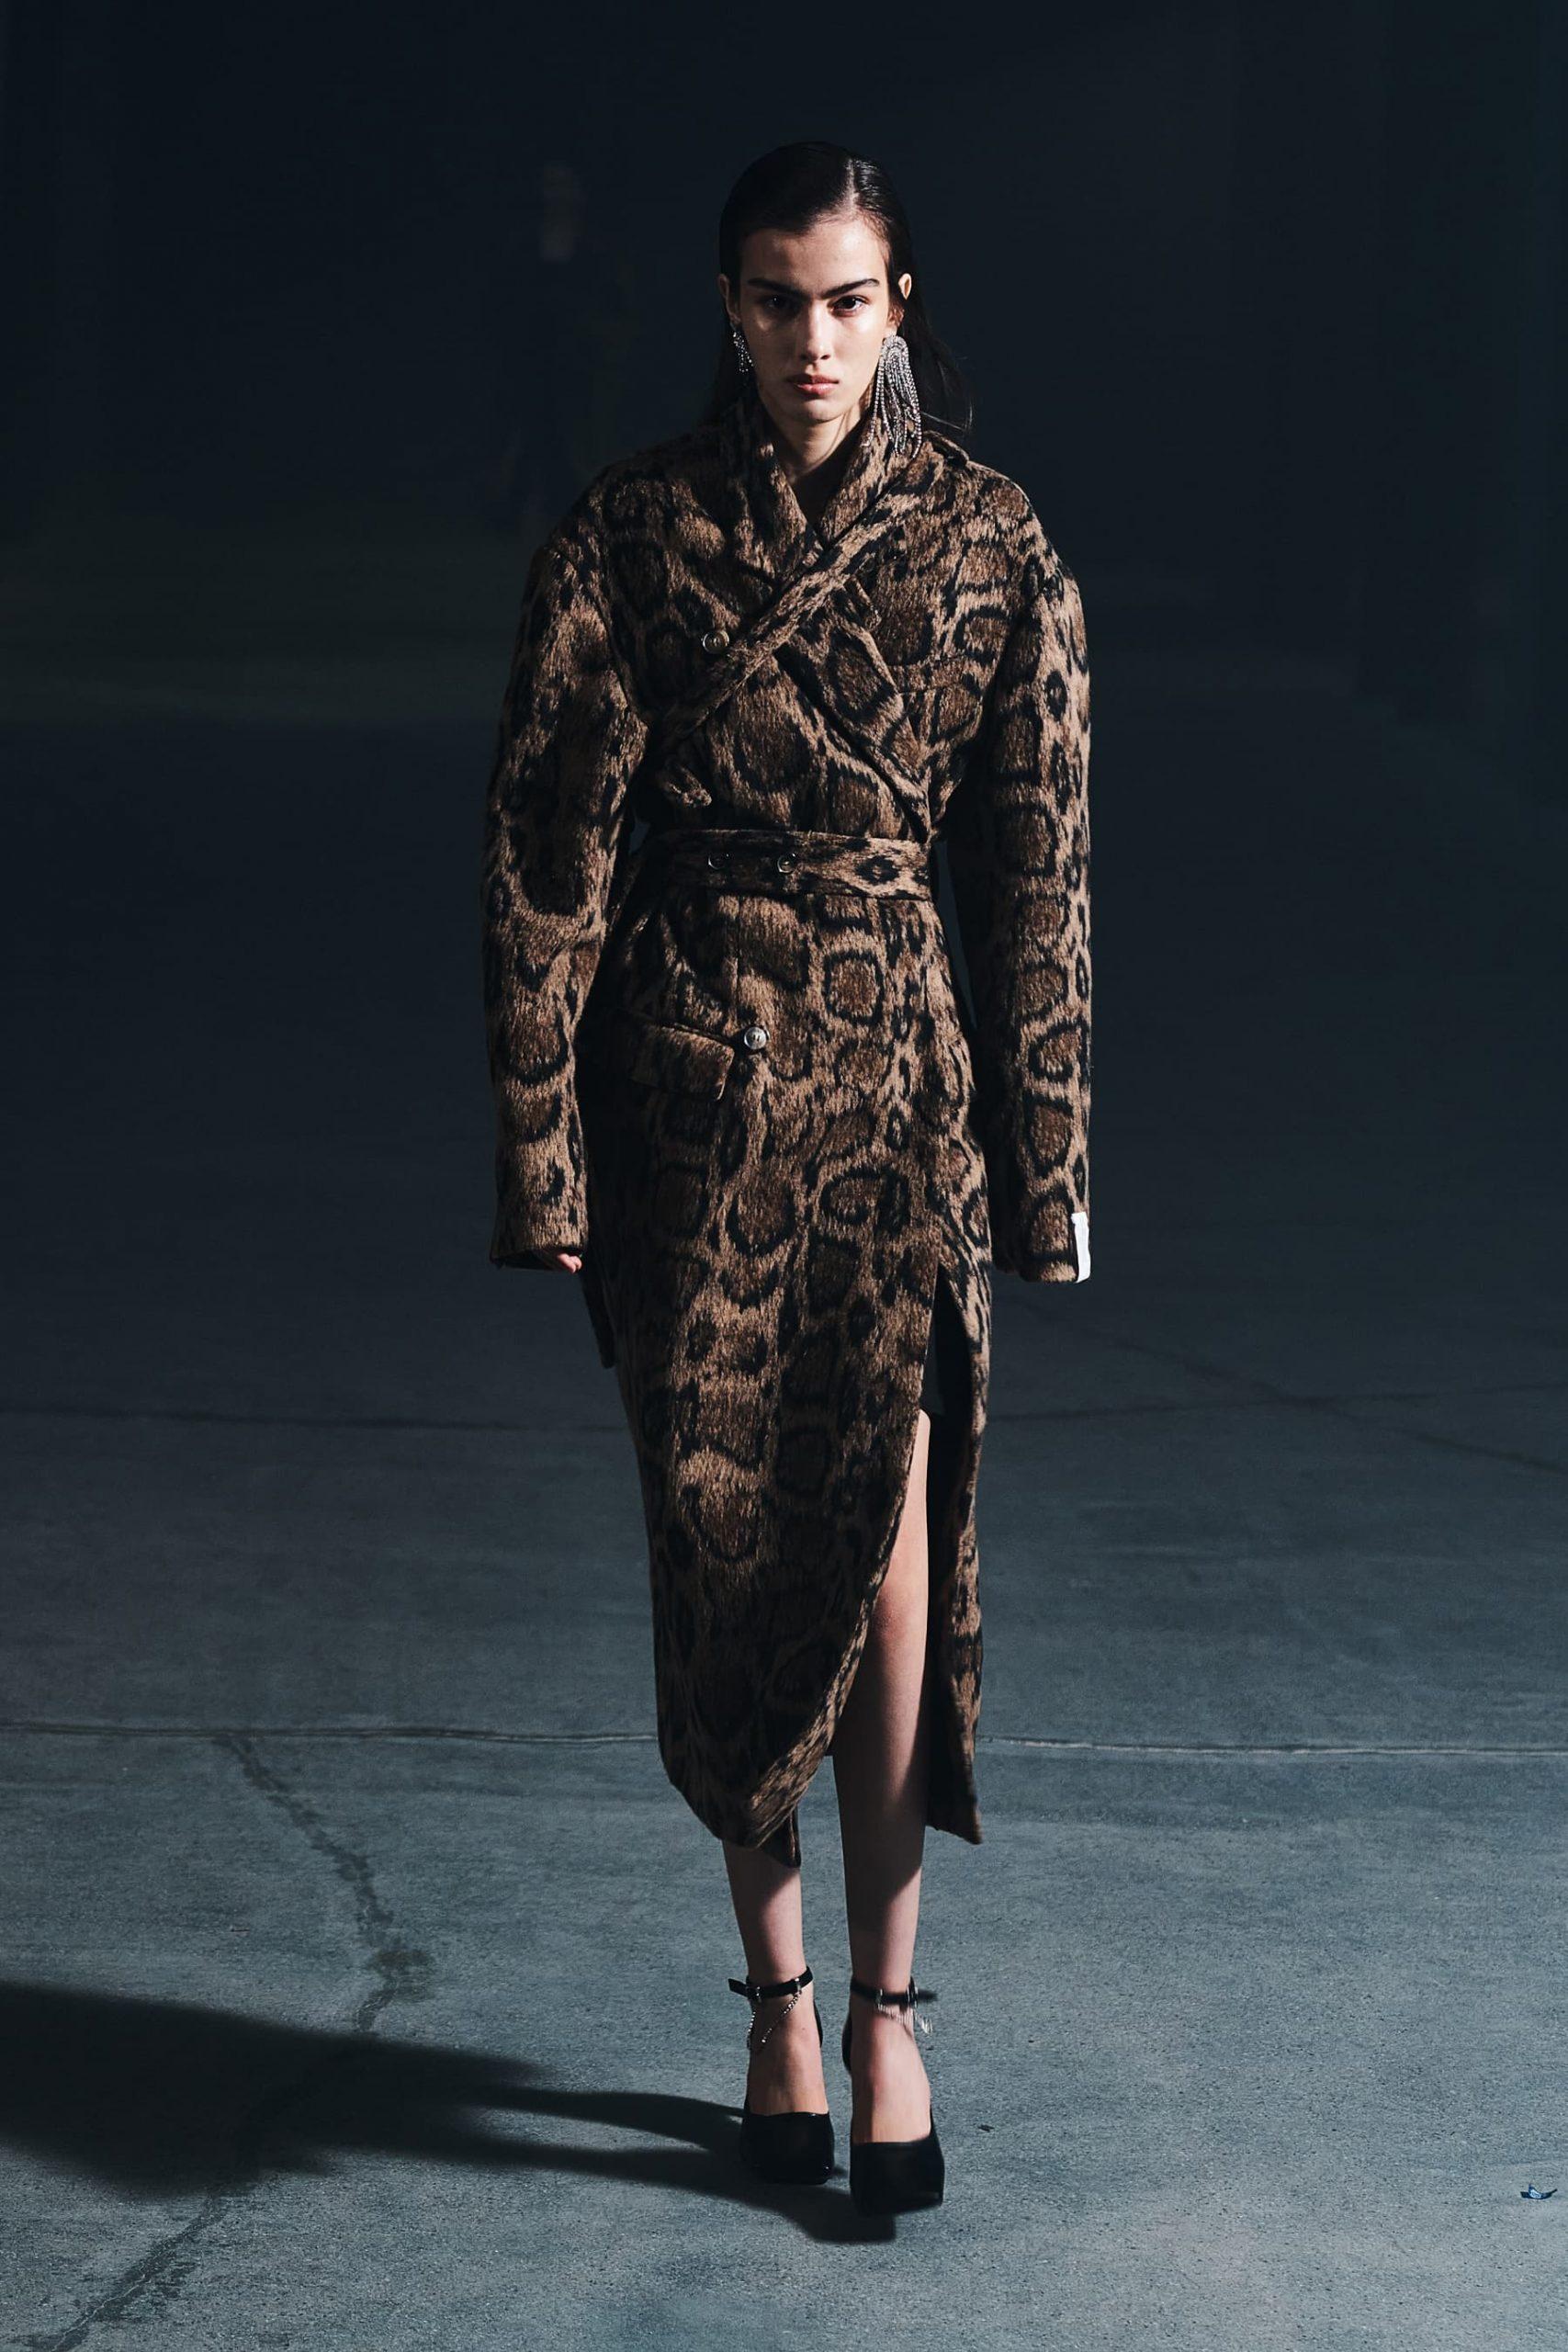 Altuzarra, Elie Saab, Rokh, Calvin Luo, & Andreas Kronthaler/Vivienne Westwood Fall 2021 Fashion Show Review